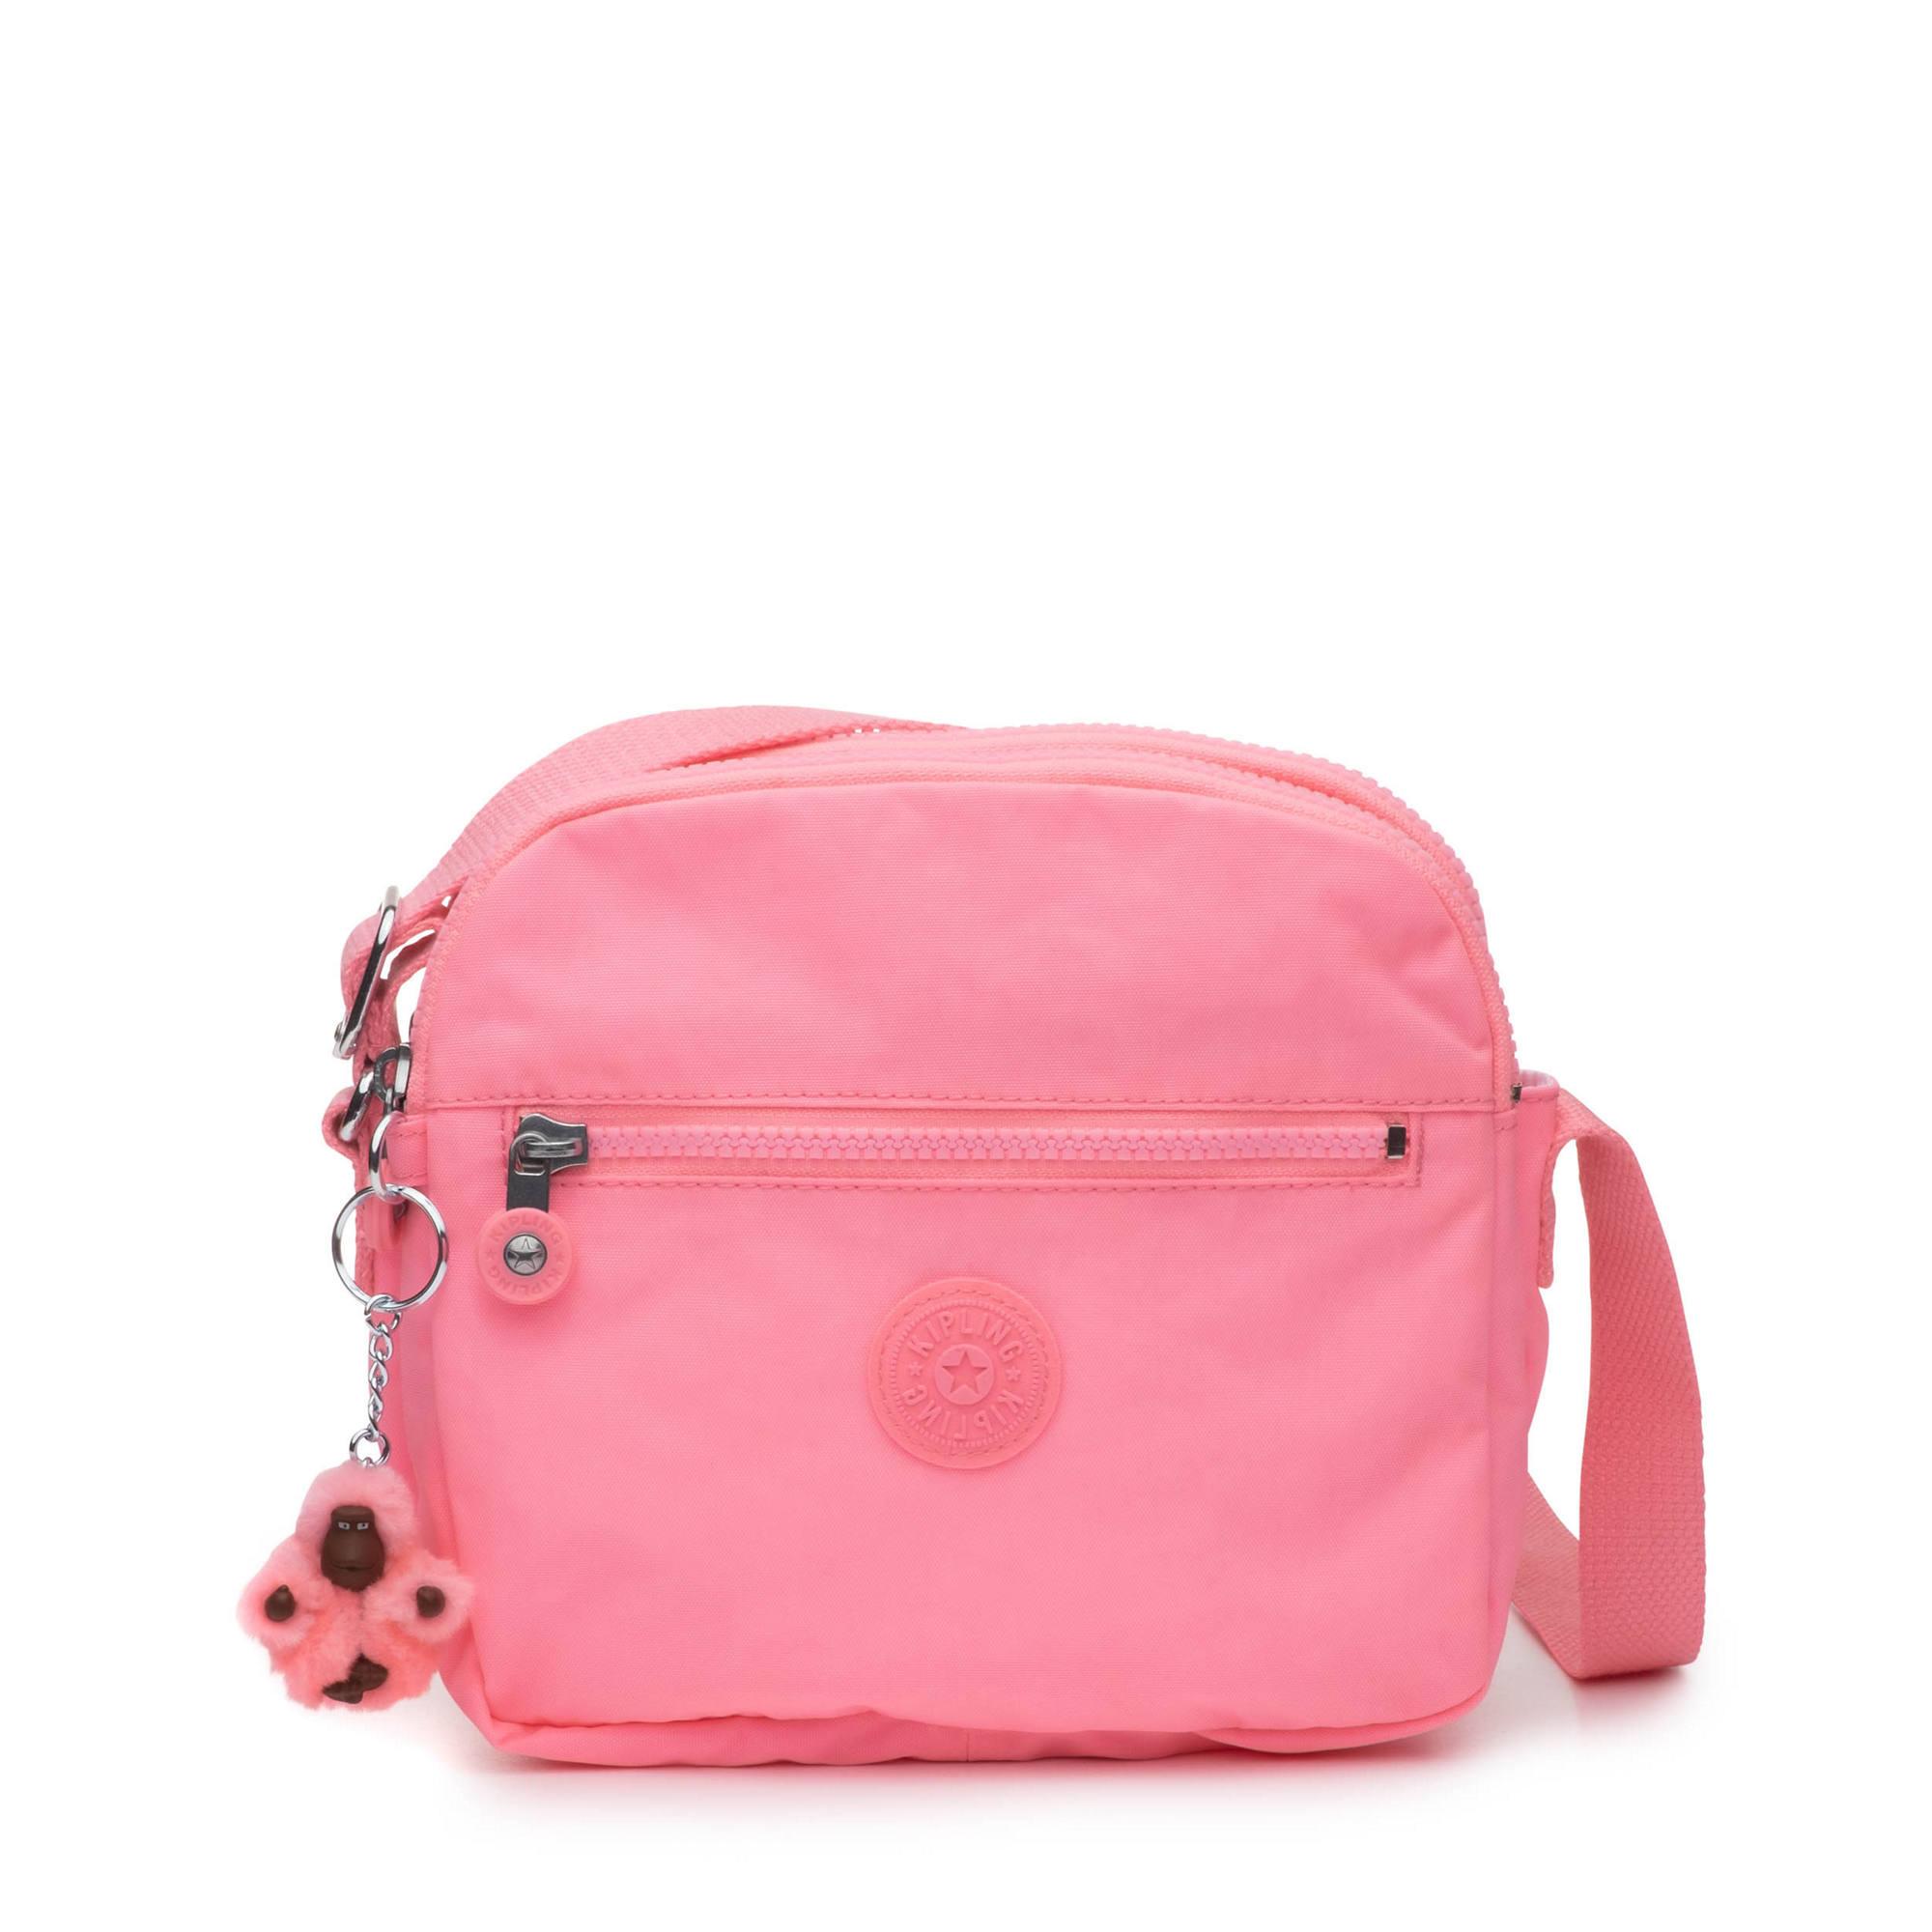 5492f4362 Keefe Crossbody Bag,Conversation Heart Tonal Zipper,large